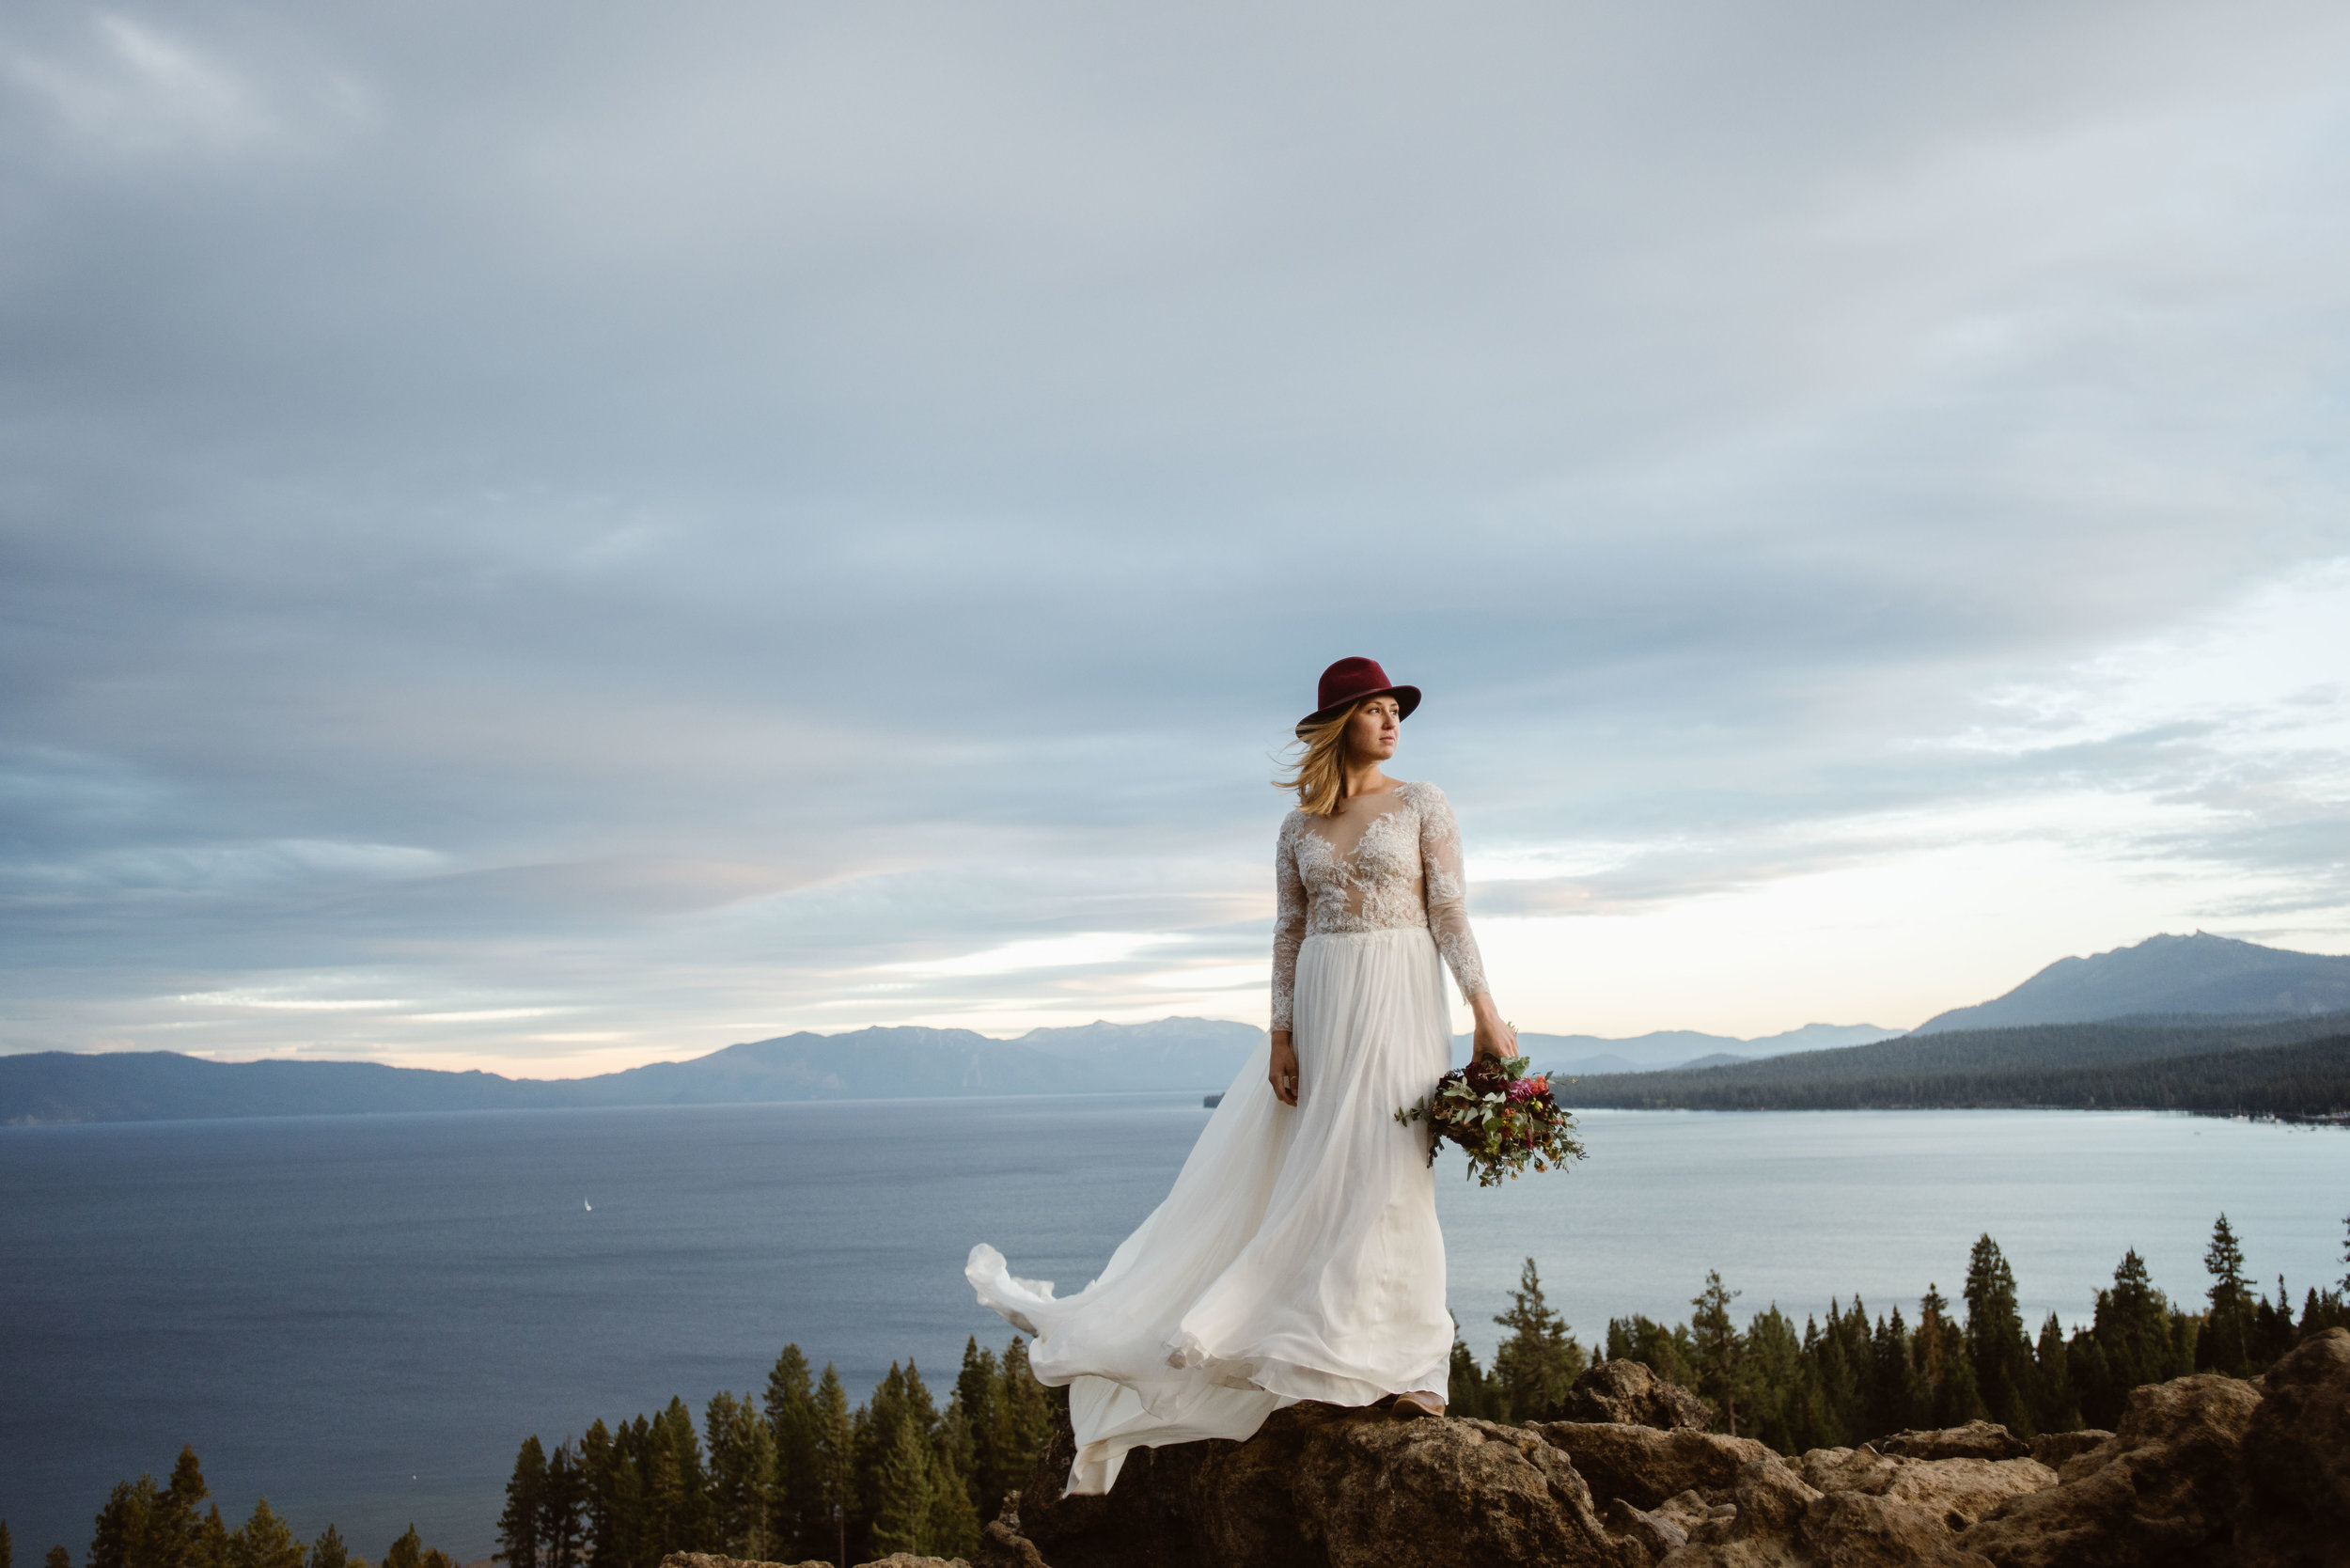 boho-wedding-dress-for-elopement